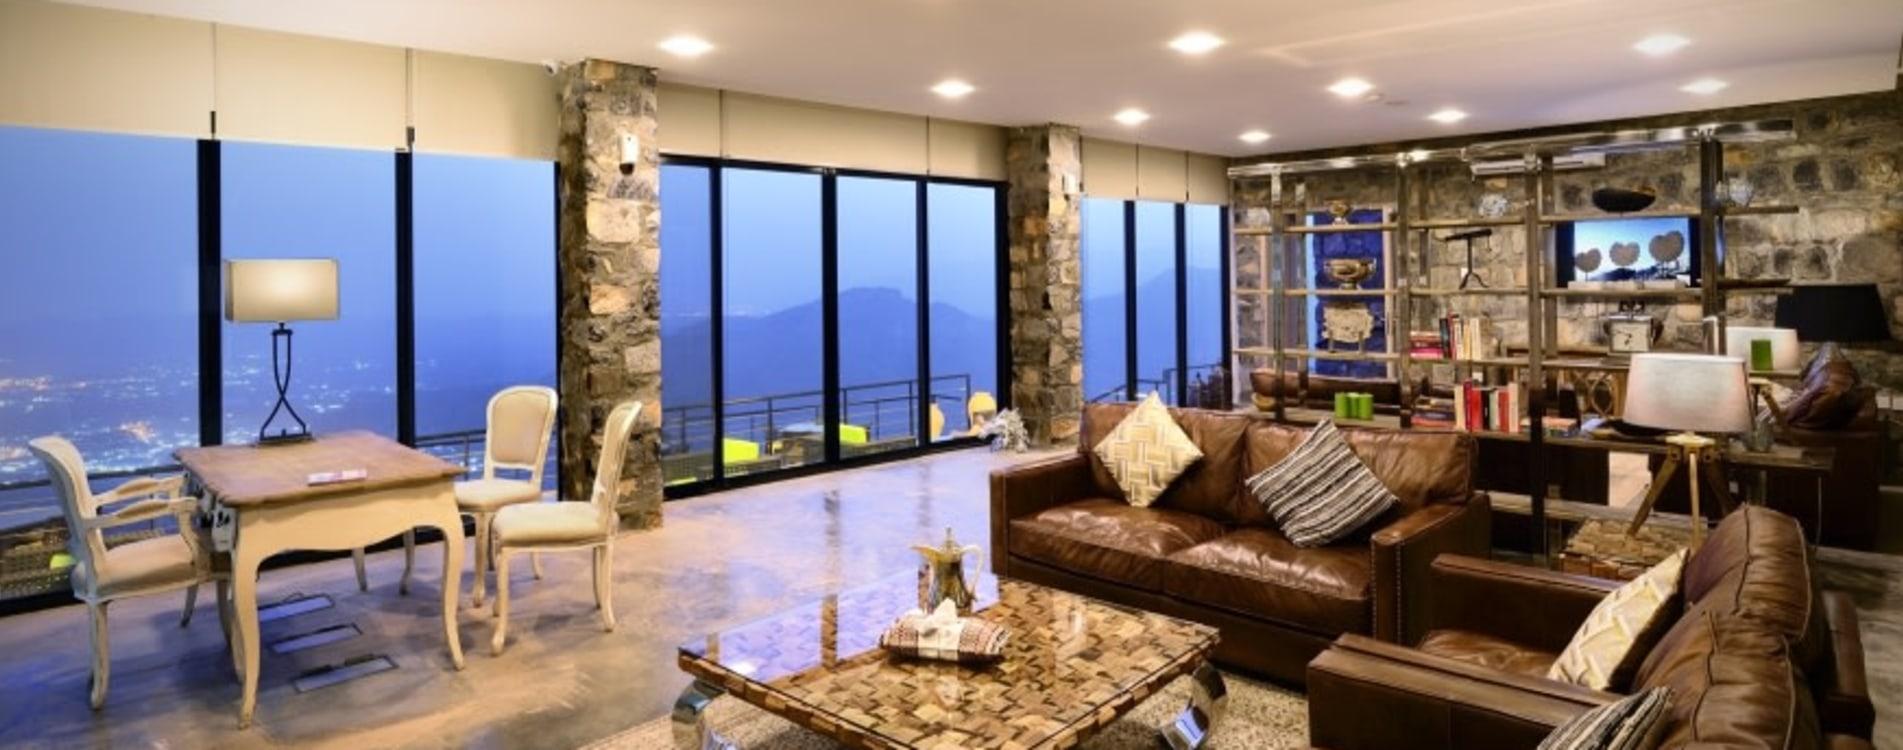 The-View-Oman-Lobby-Interior.jpg